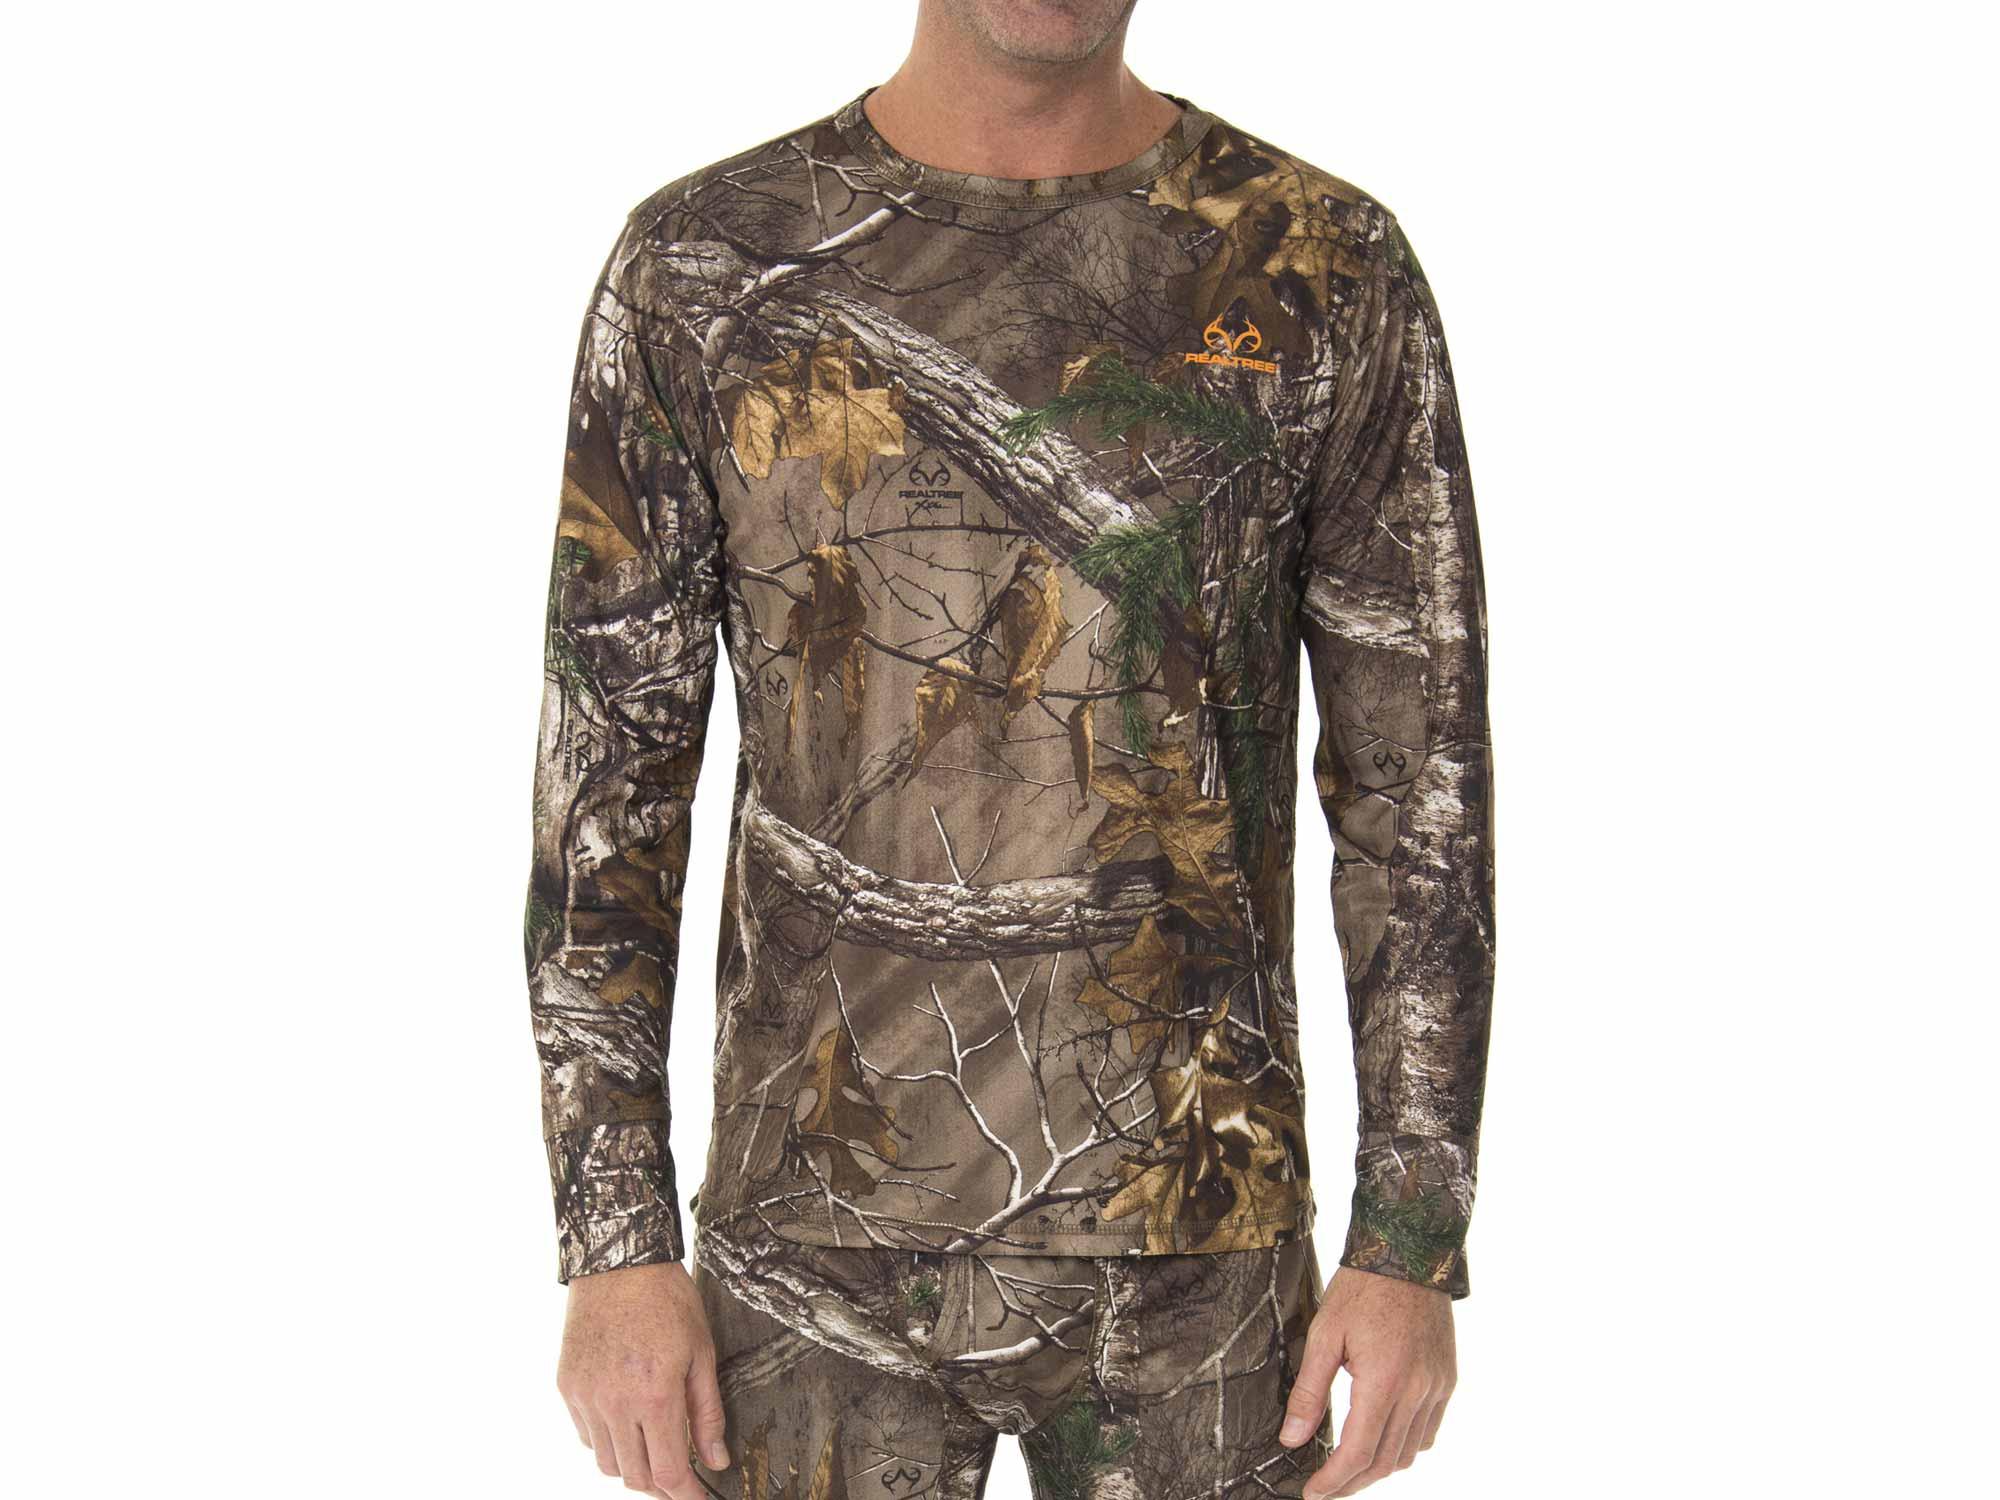 Camouflage base layer